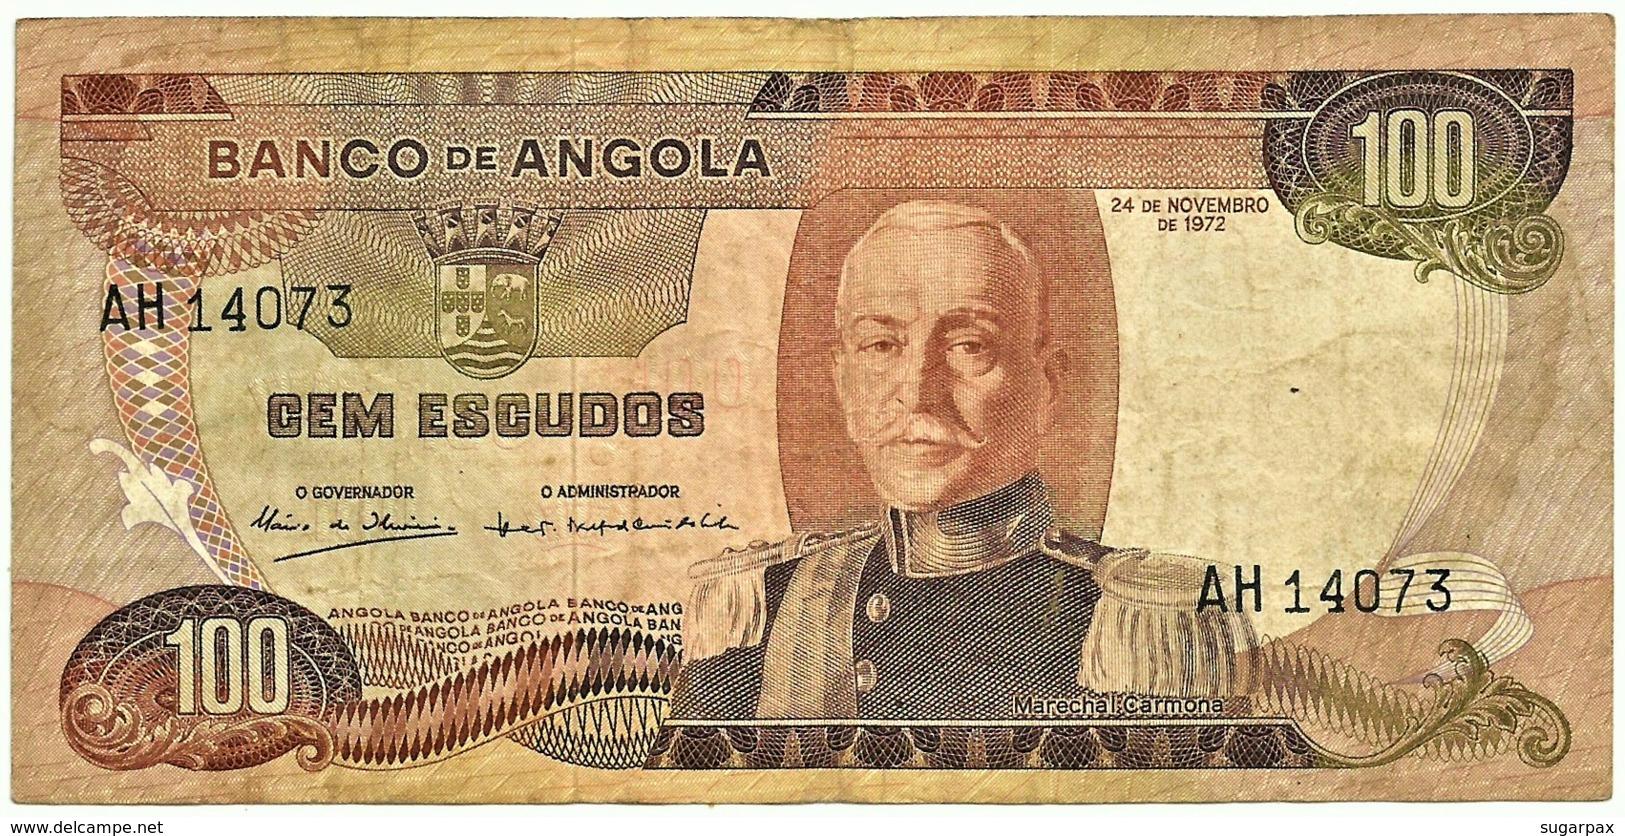 Angola - 100 Escudos - 24.11.1972 - Pick 101 - Série AH - Marechal Carmona - PORTUGAL - Angola